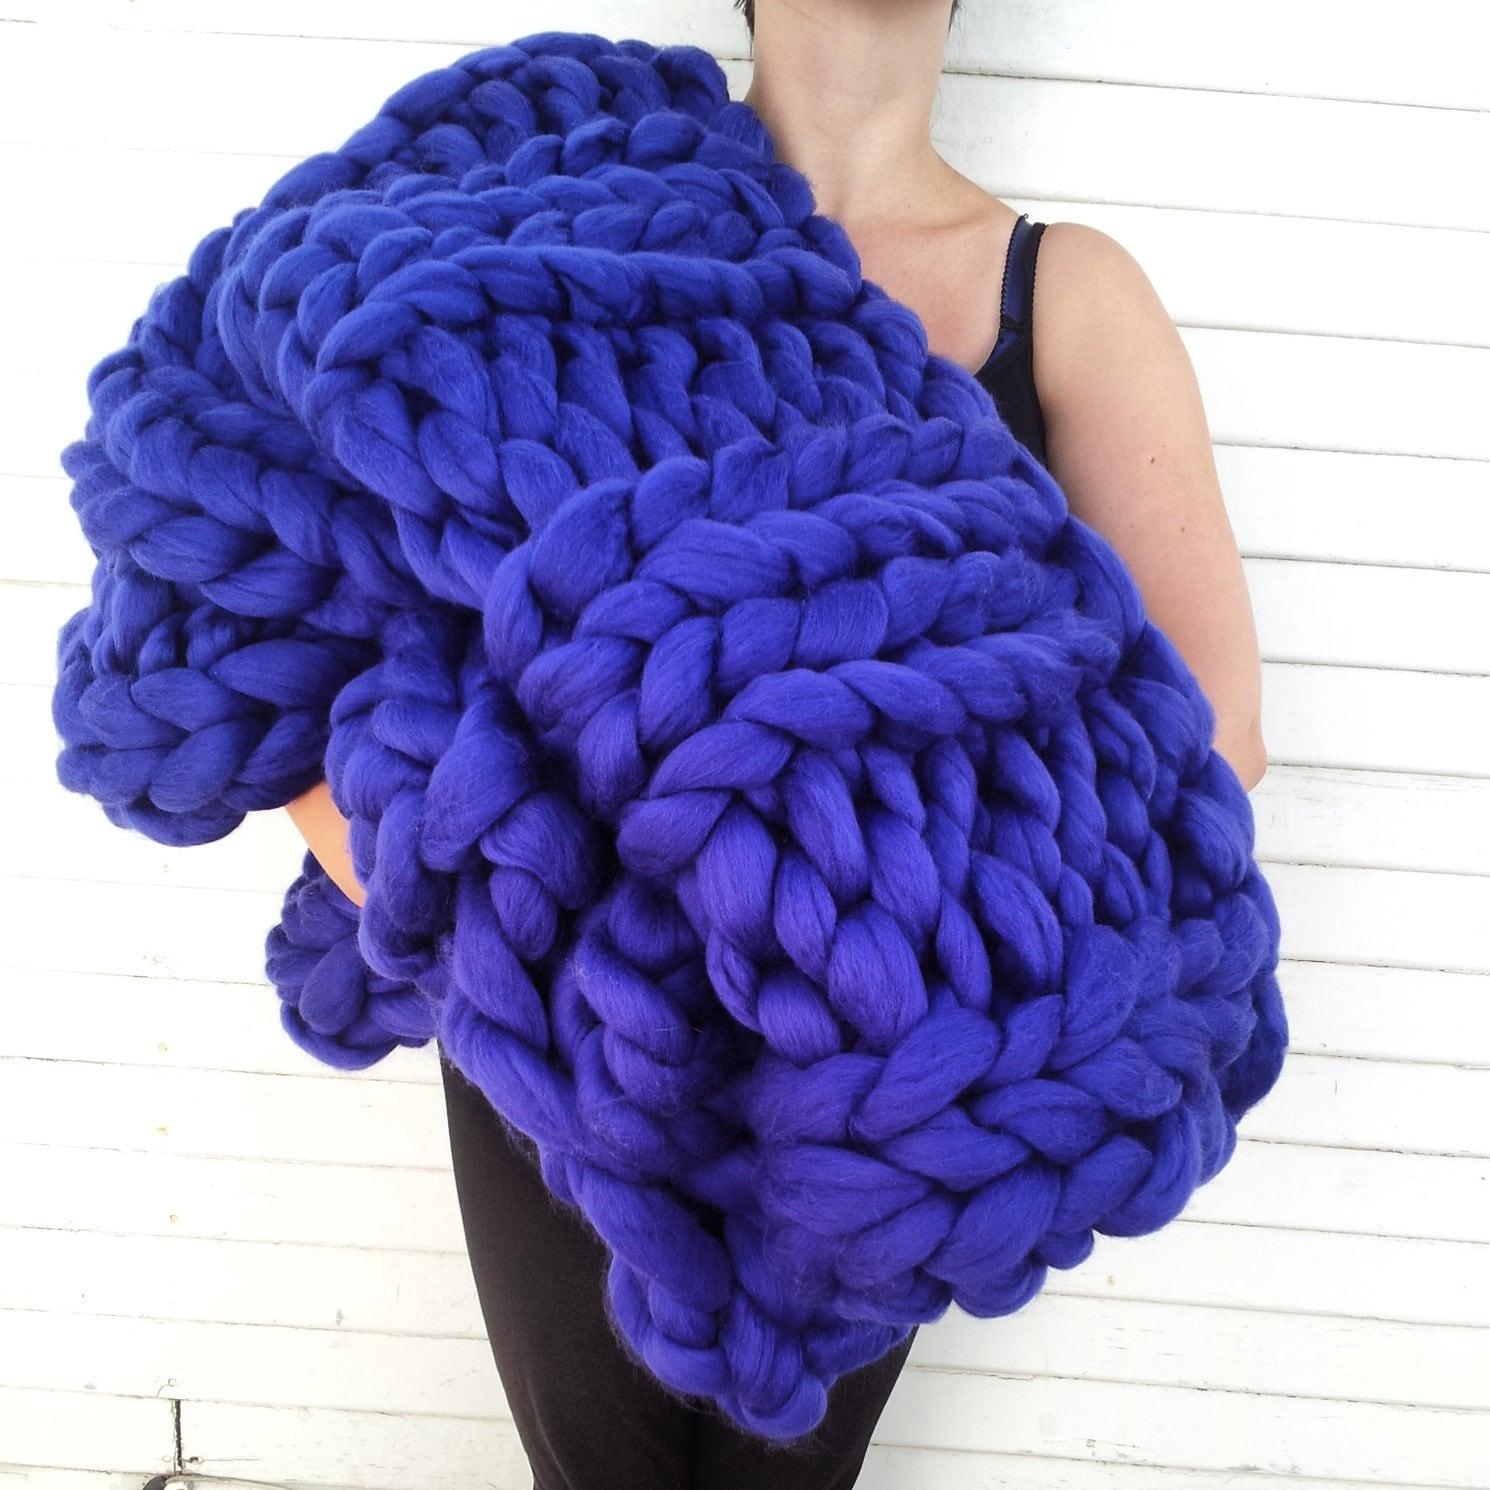 super chunky knit merino blanket 40 x 58 by lilyandpeabody. Black Bedroom Furniture Sets. Home Design Ideas